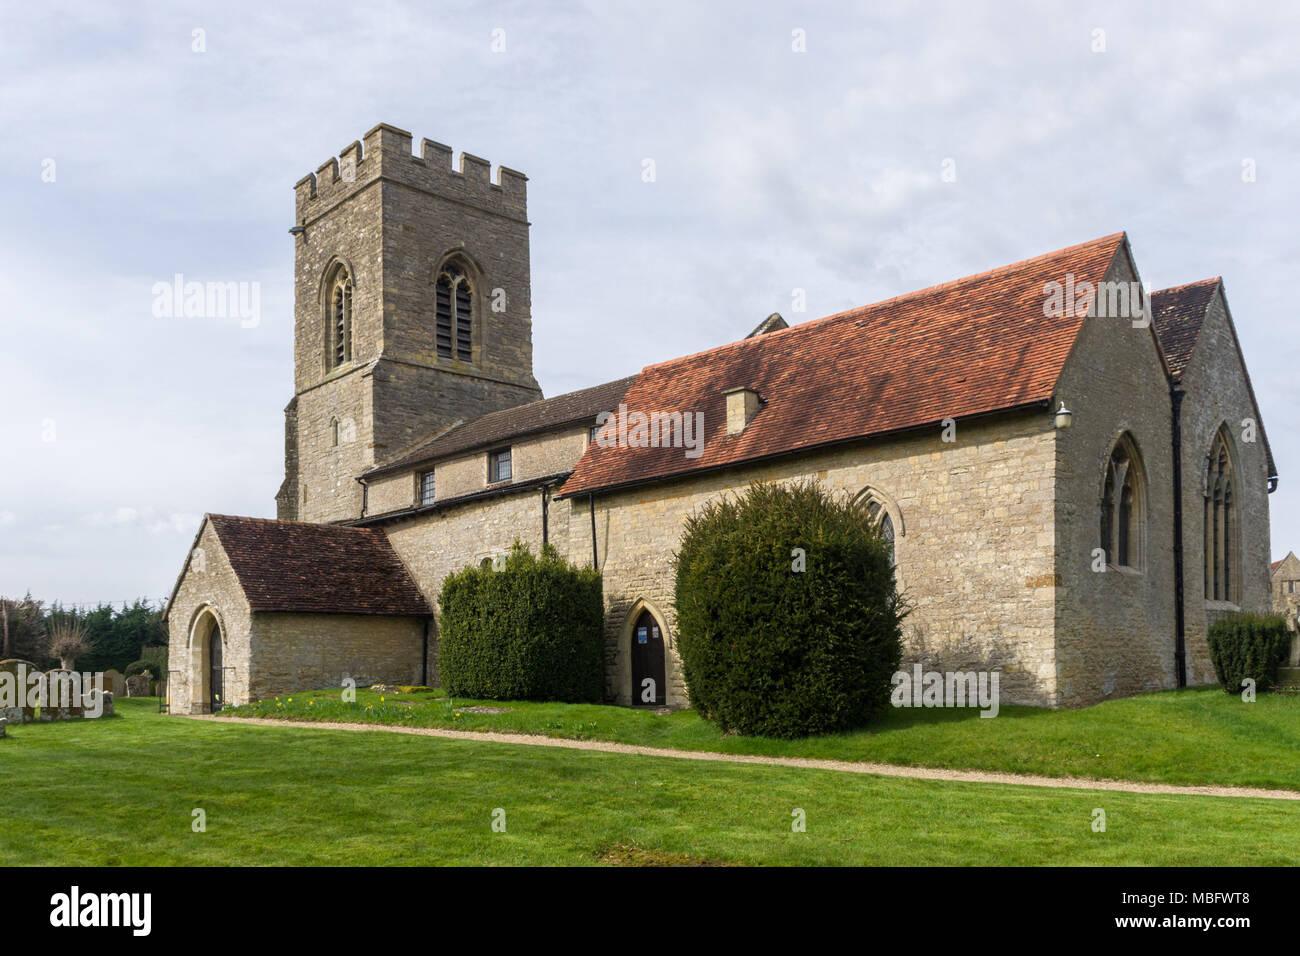 the village church christian dating